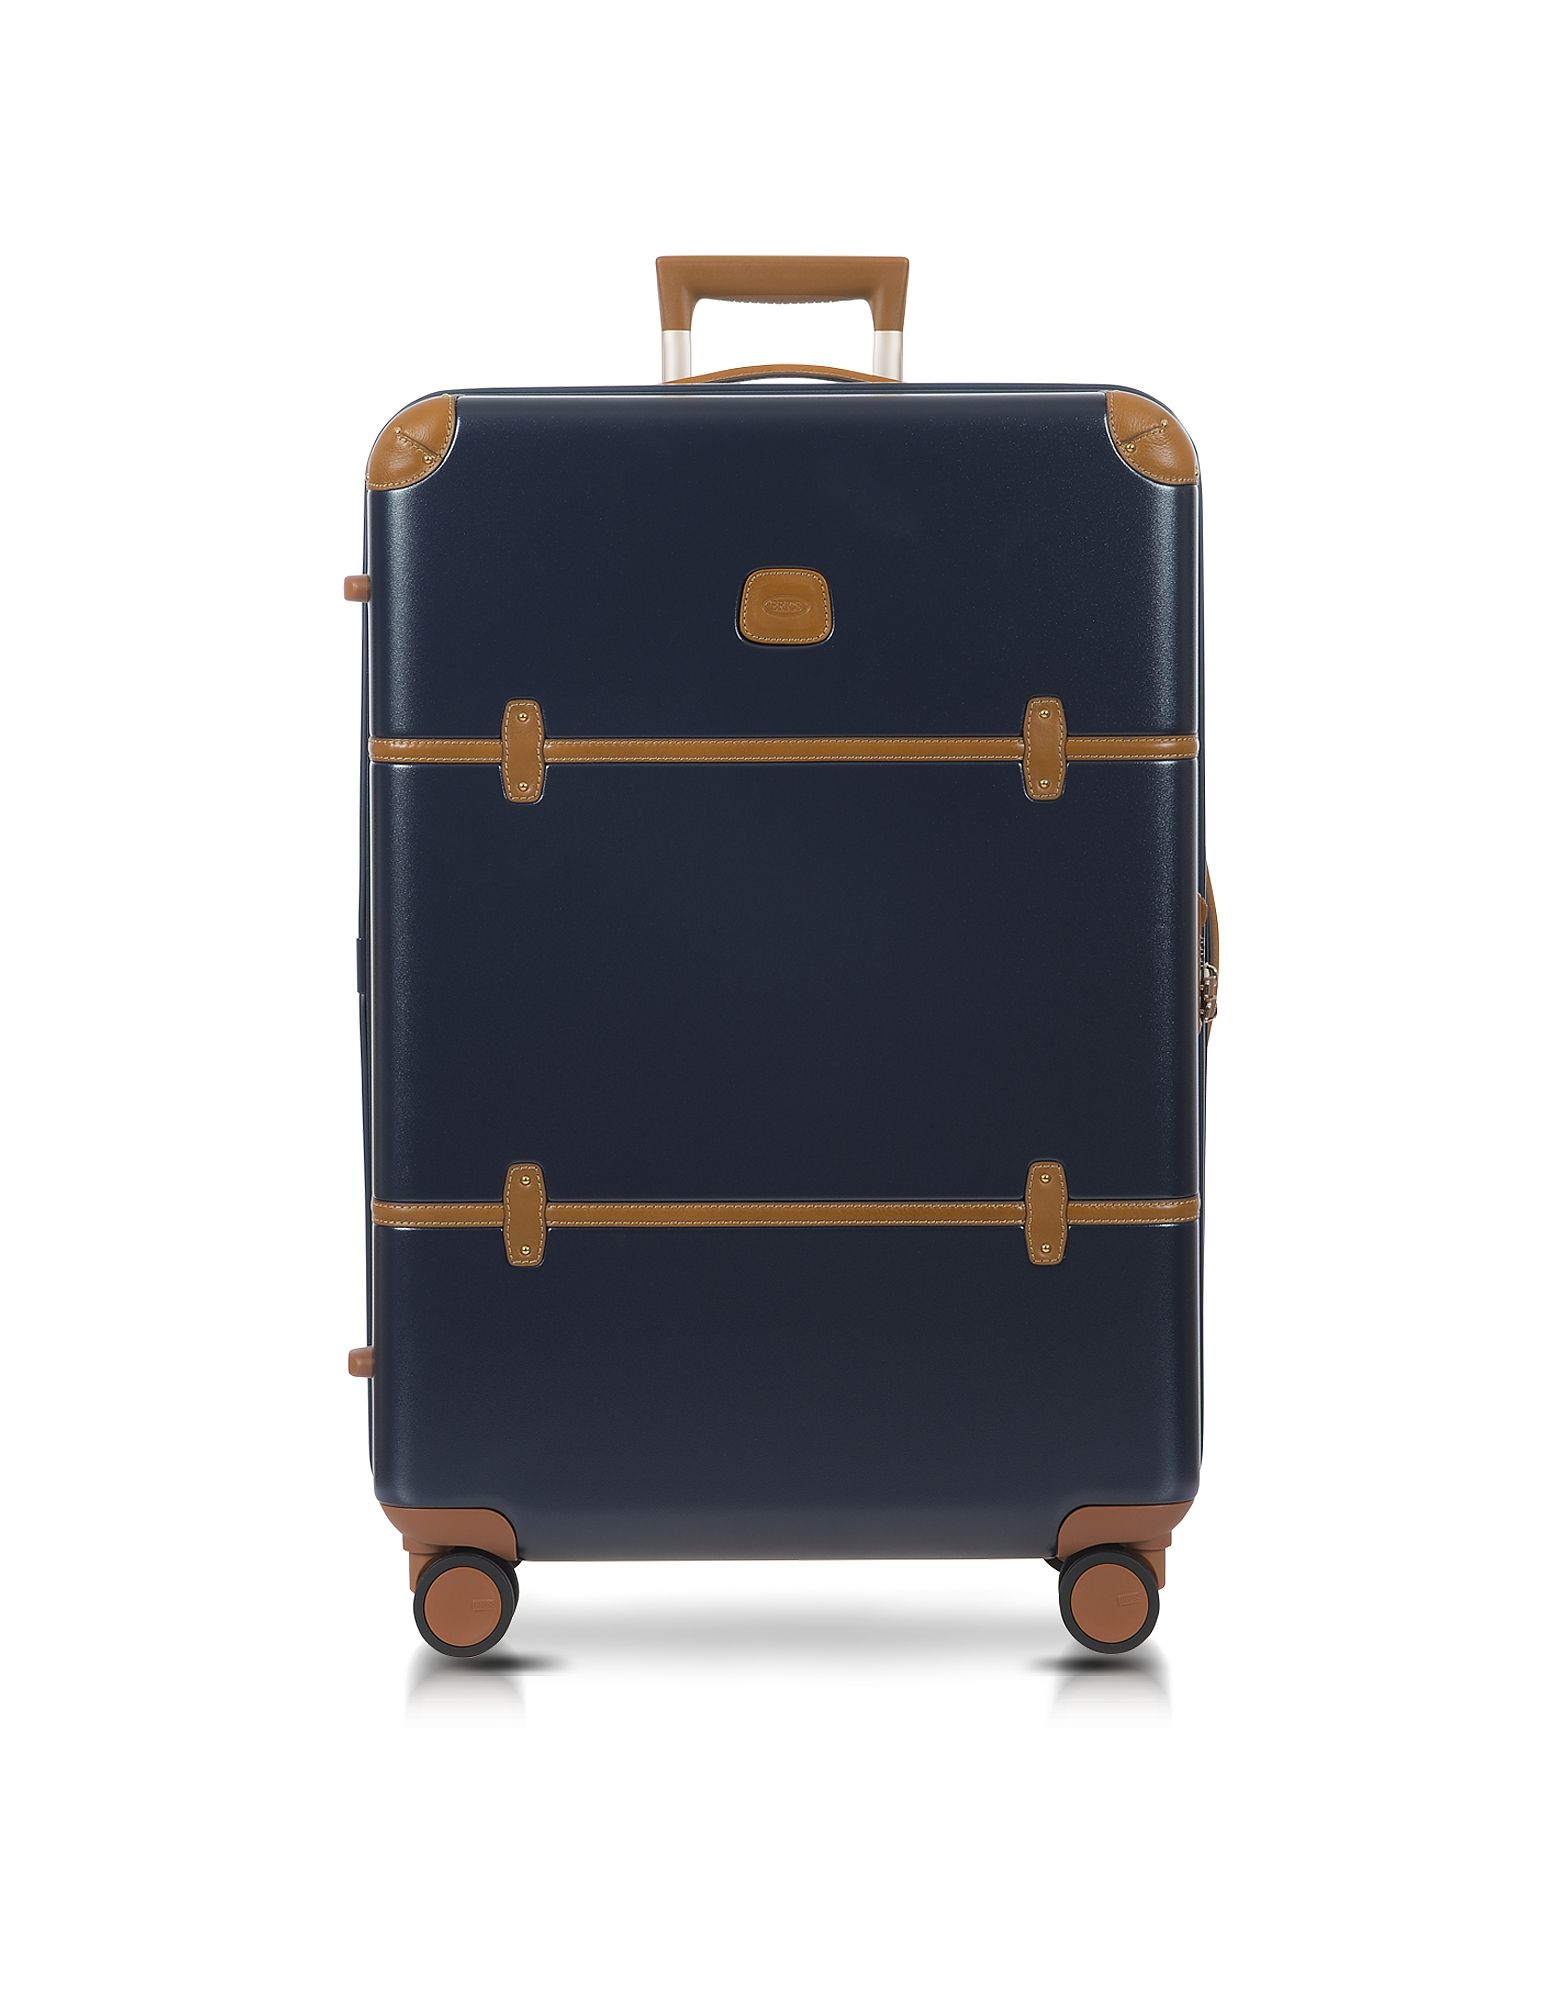 Bellagio V2.0 - Синий и Табачный Чемодан 30″ на Колесиках